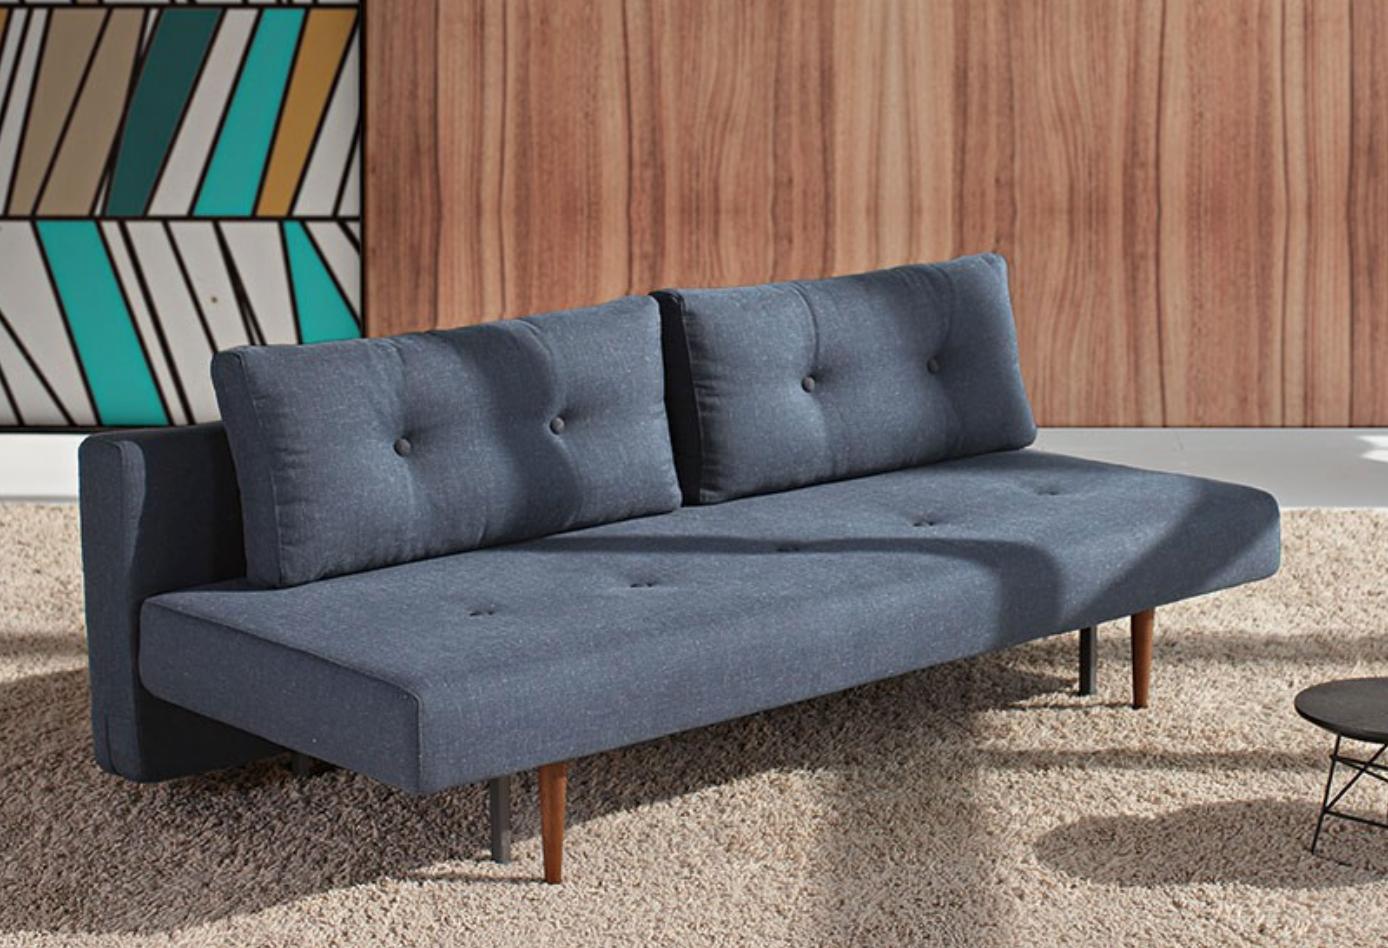 Recast Modern Sofa Bed